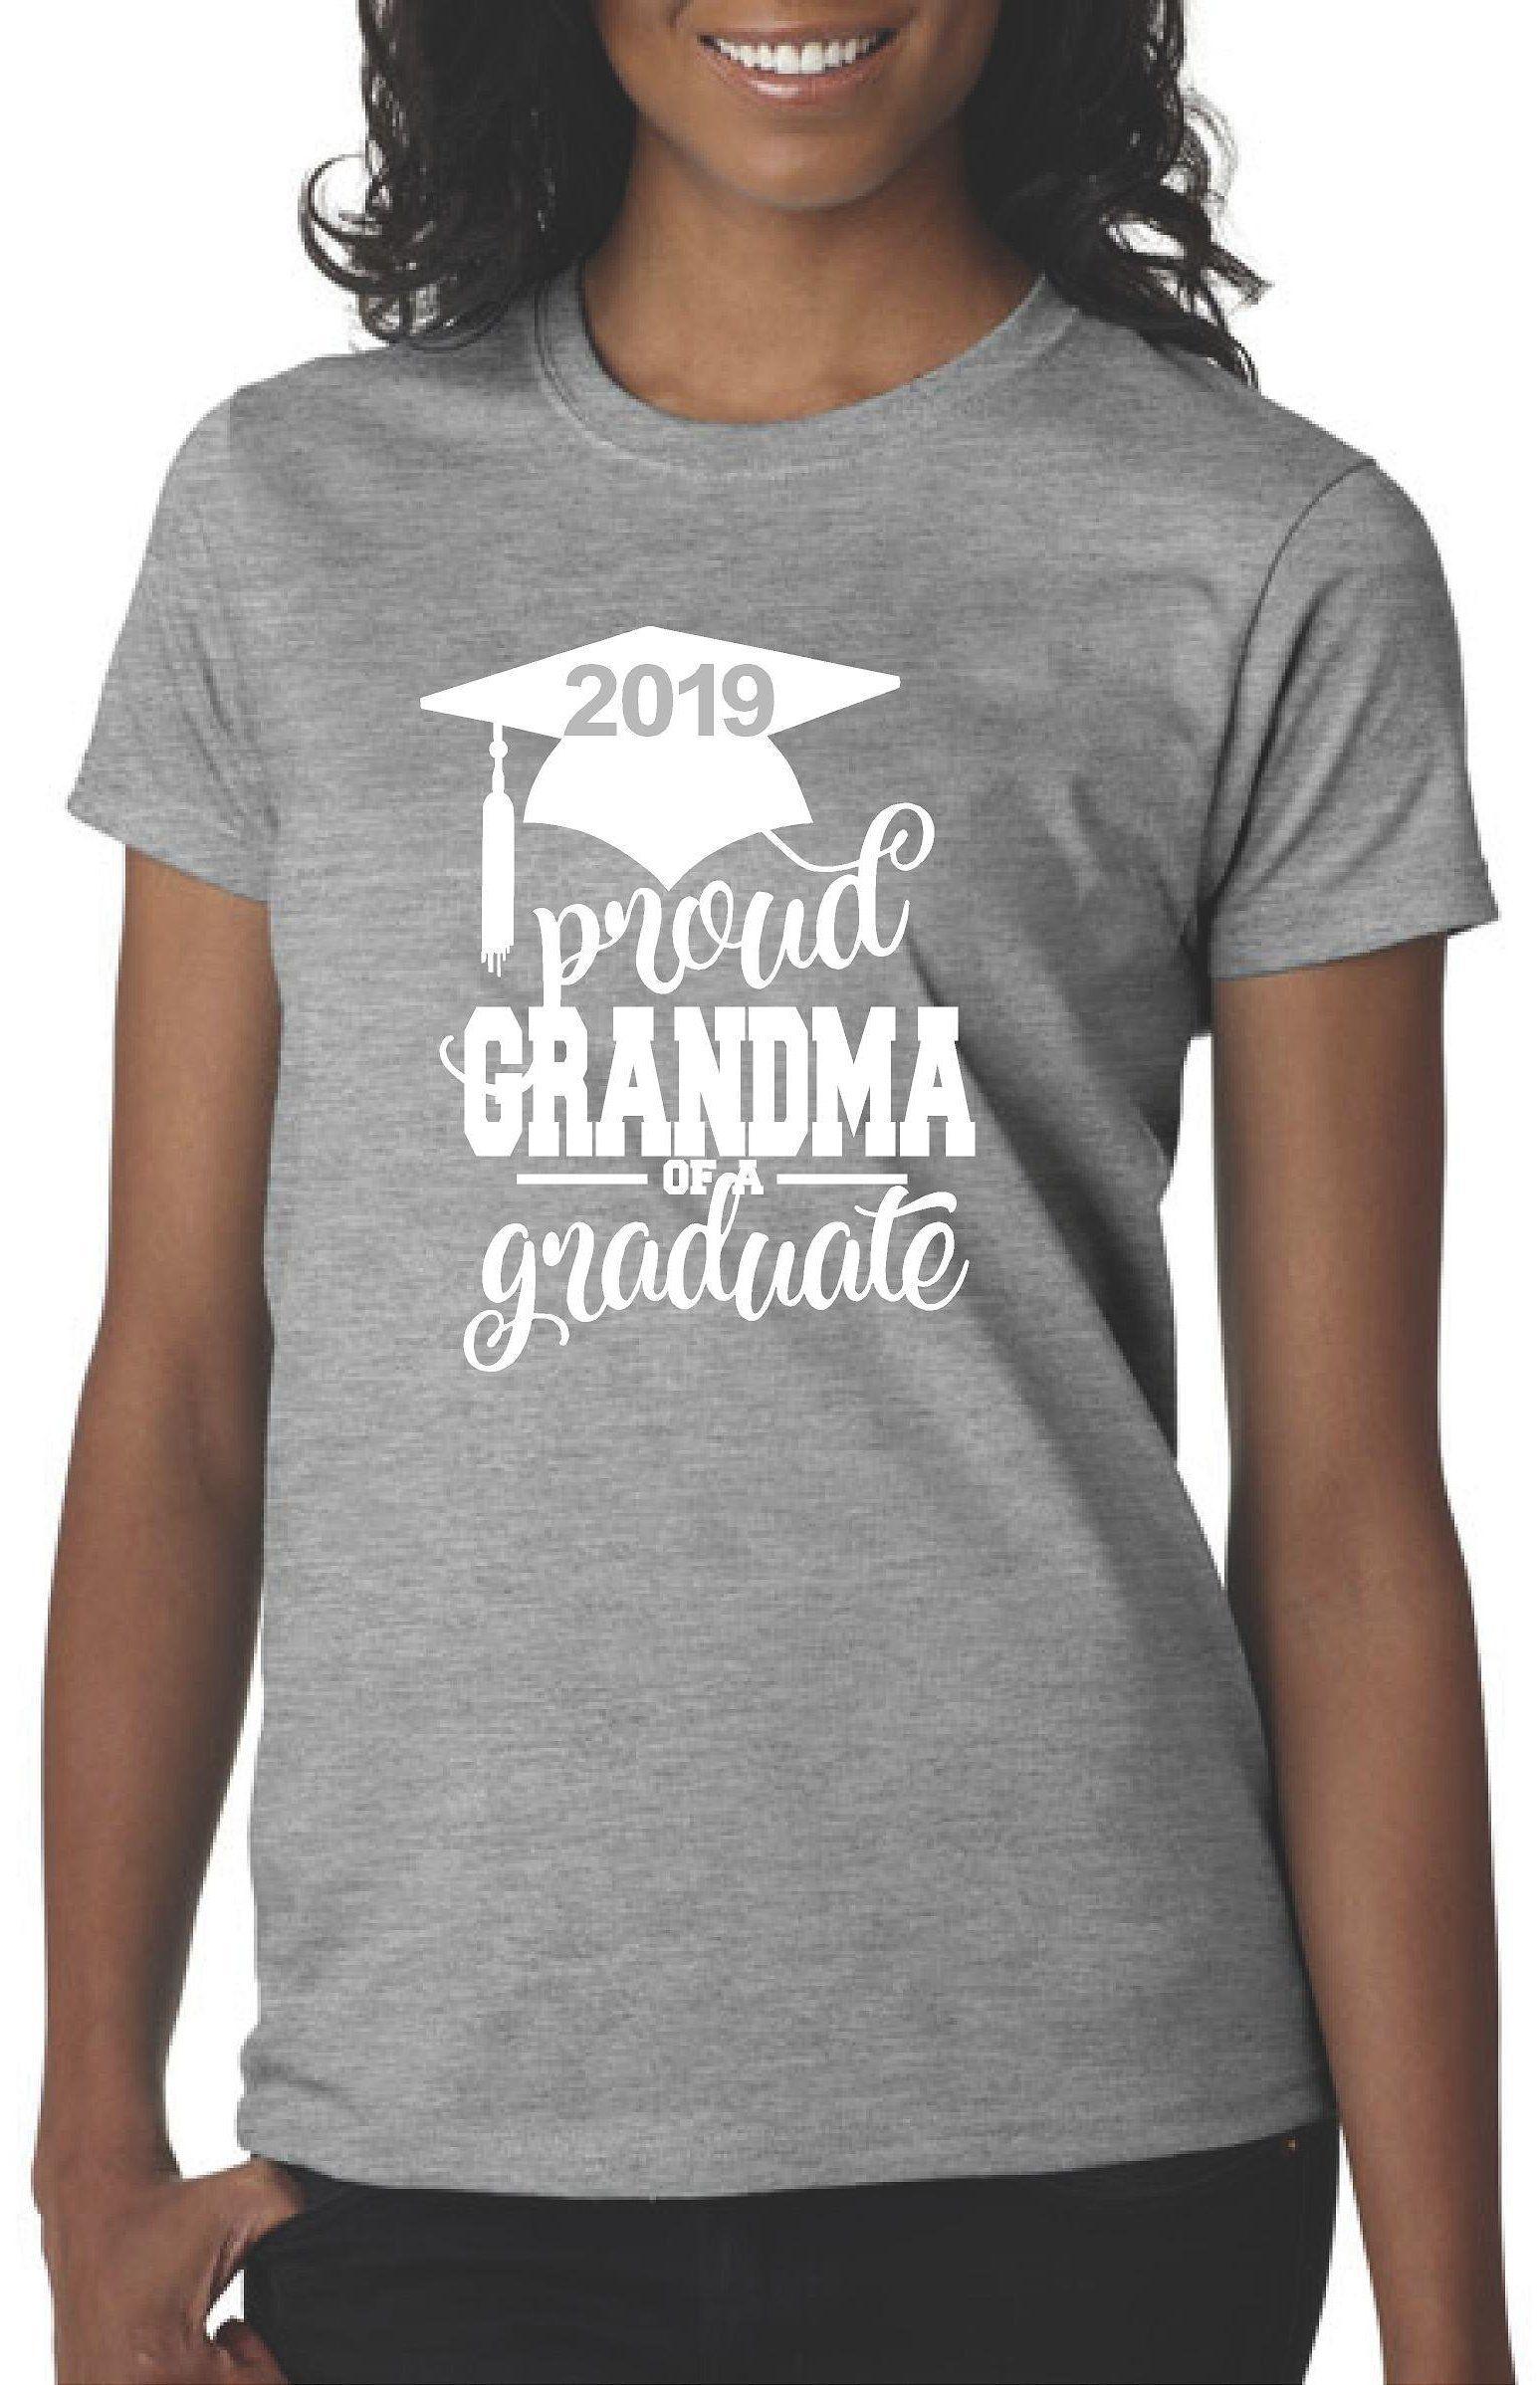 ed4b1f62 Grandma of the Graduate T-shirt / Graduation Shirts for Family and Friends